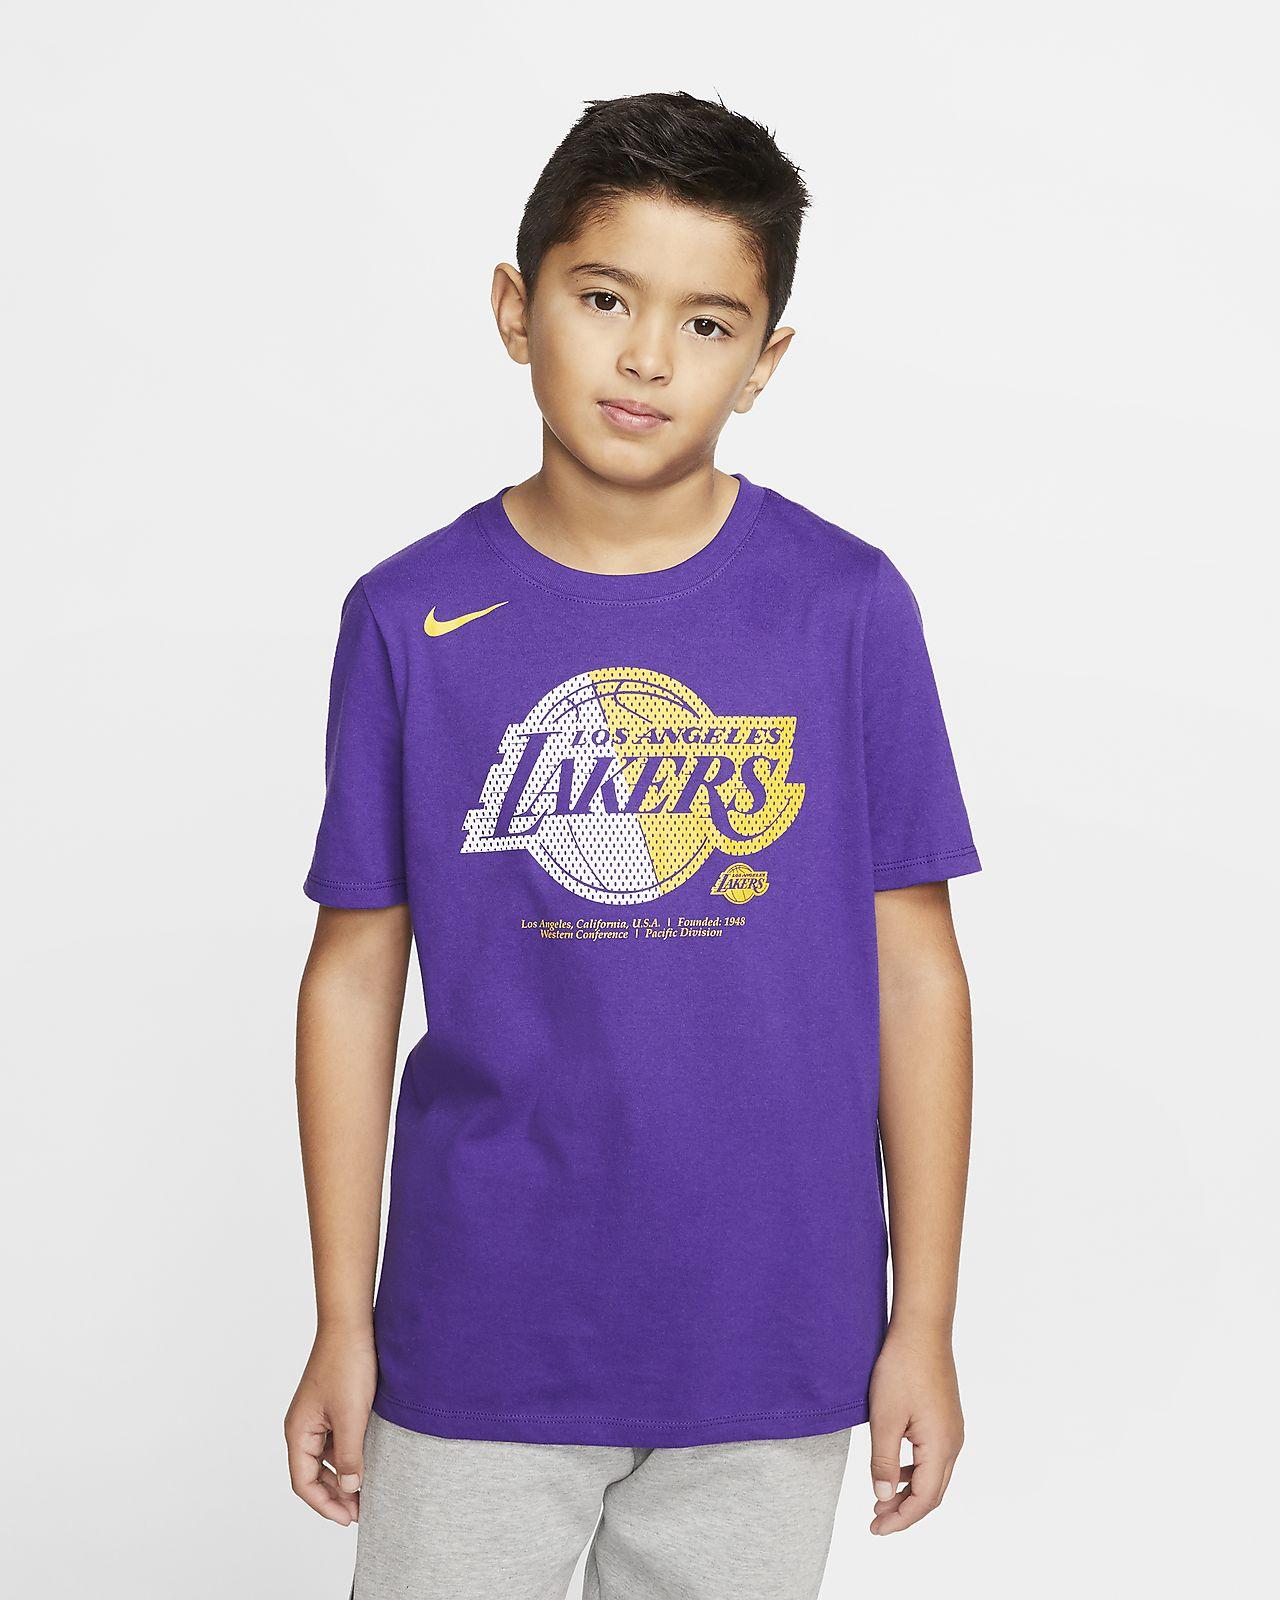 Lakers Logo Older Kids' Nike Dri FIT NBA T Shirt